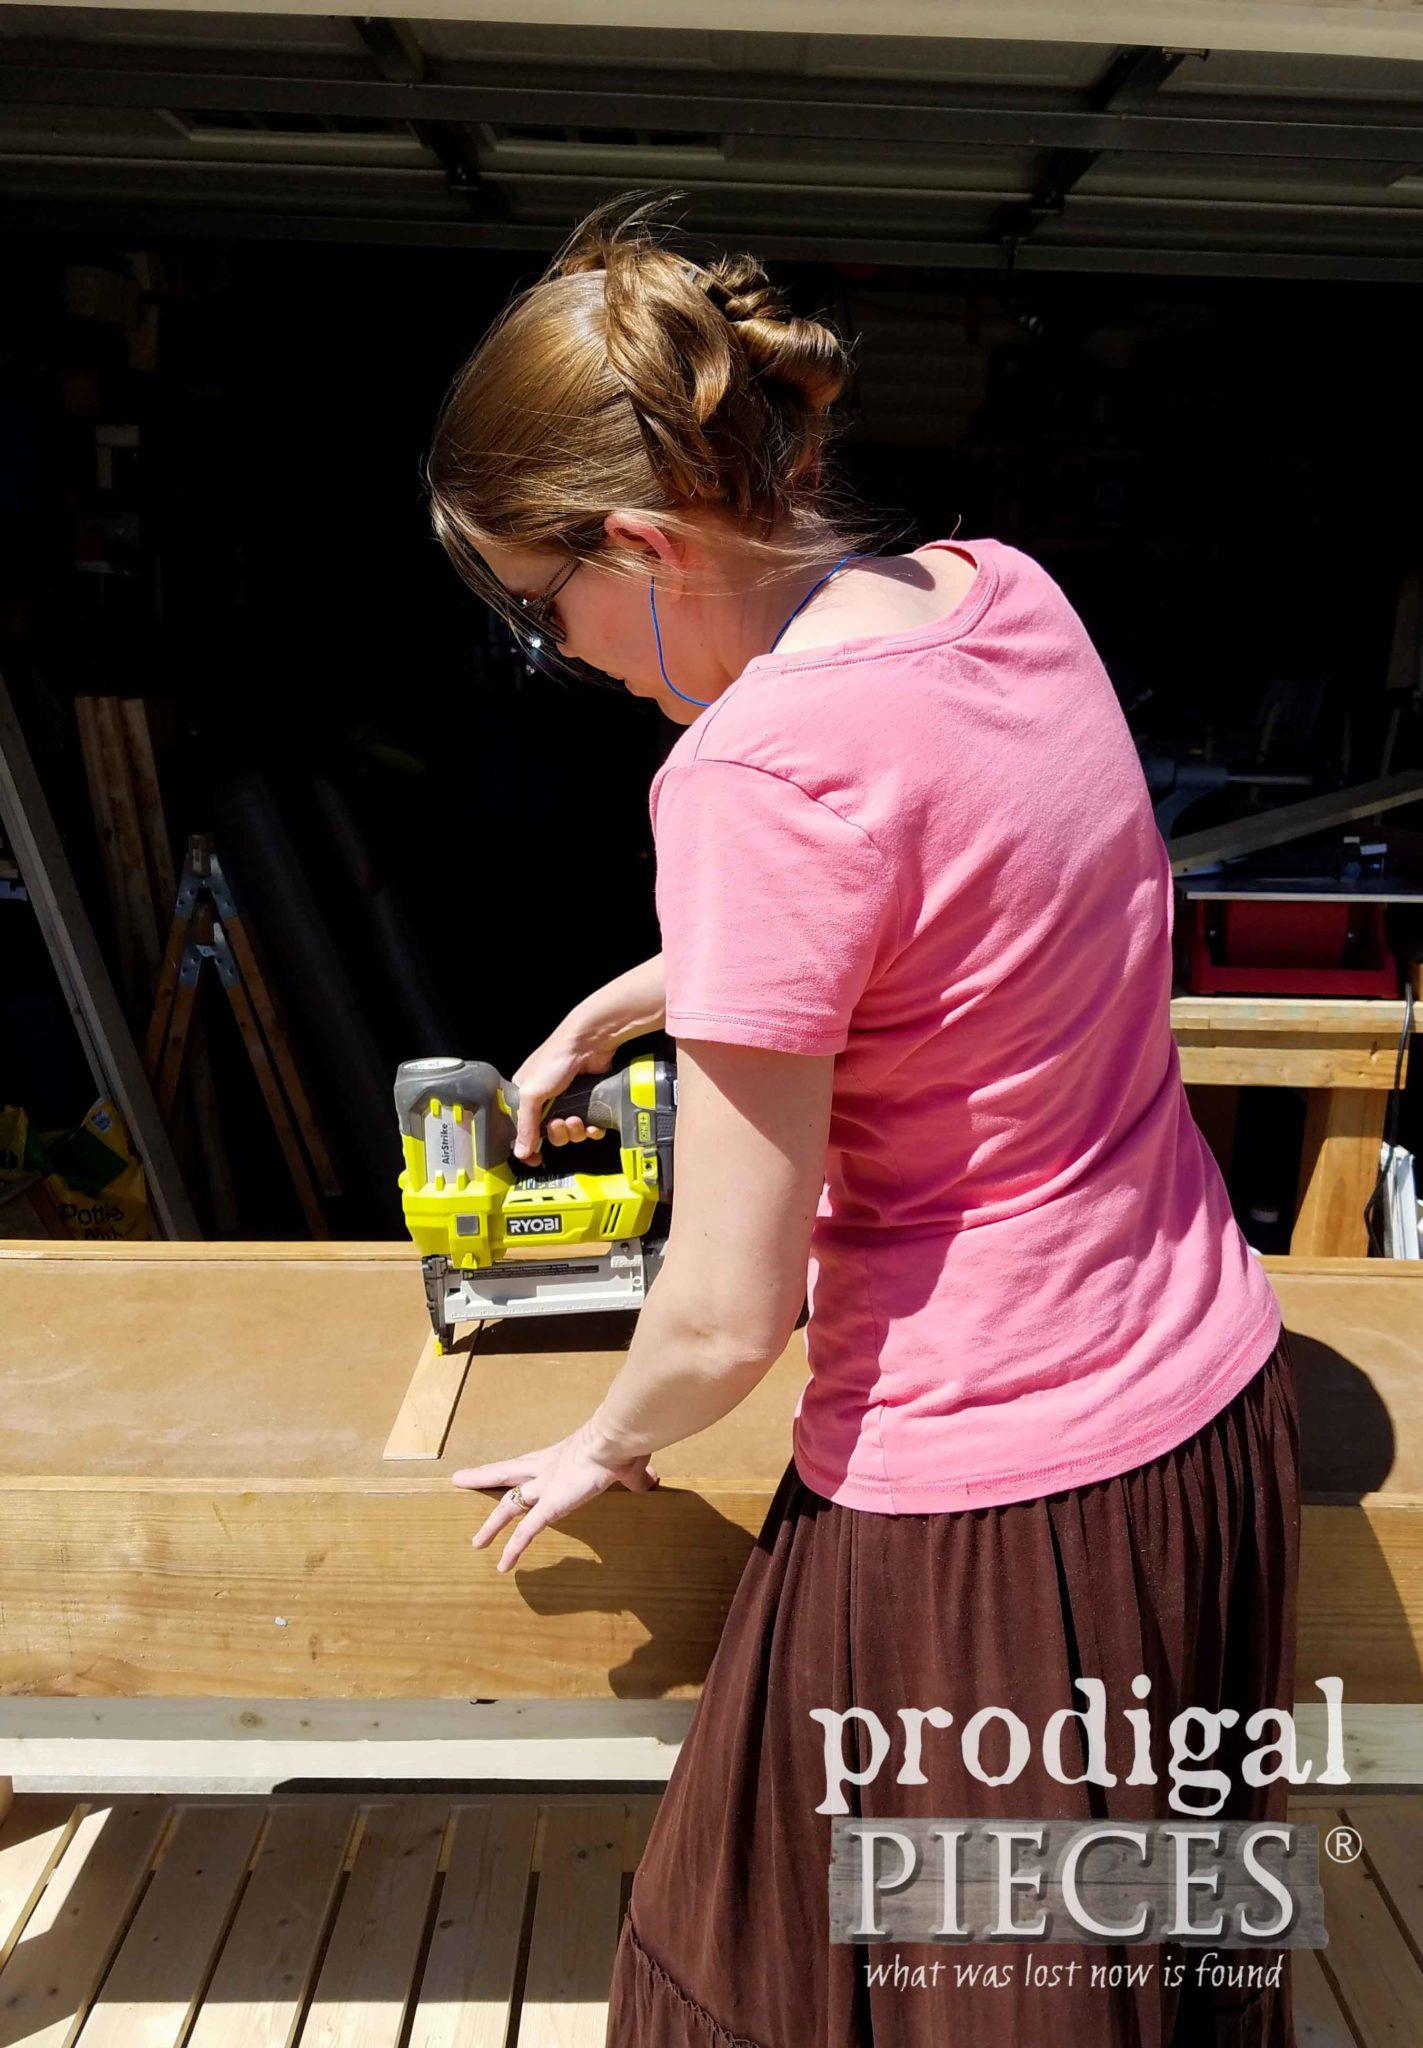 Ryobi AirStrike Cordless Stapler to help build DIY workbench by Prodigal Pieces | prodigalpieces.com